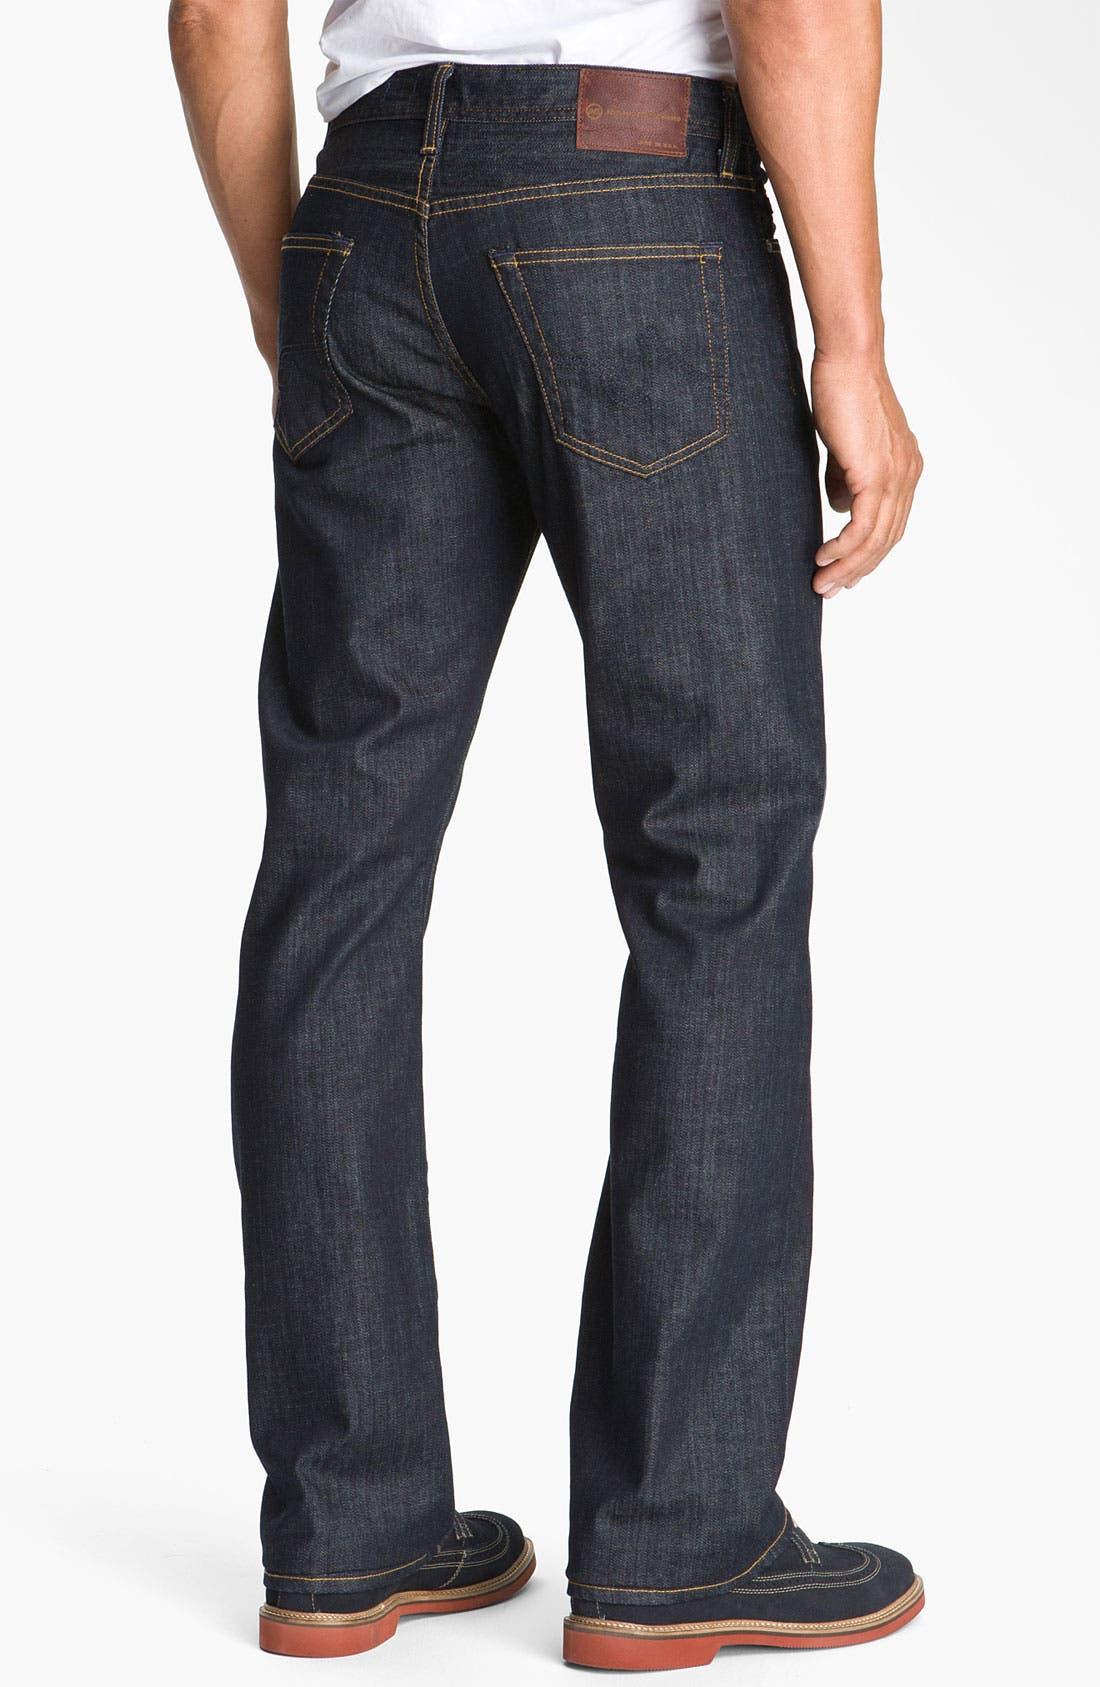 Alternate Image 1 Selected - AG 'Protégé' Straight Leg Jeans (Kent)